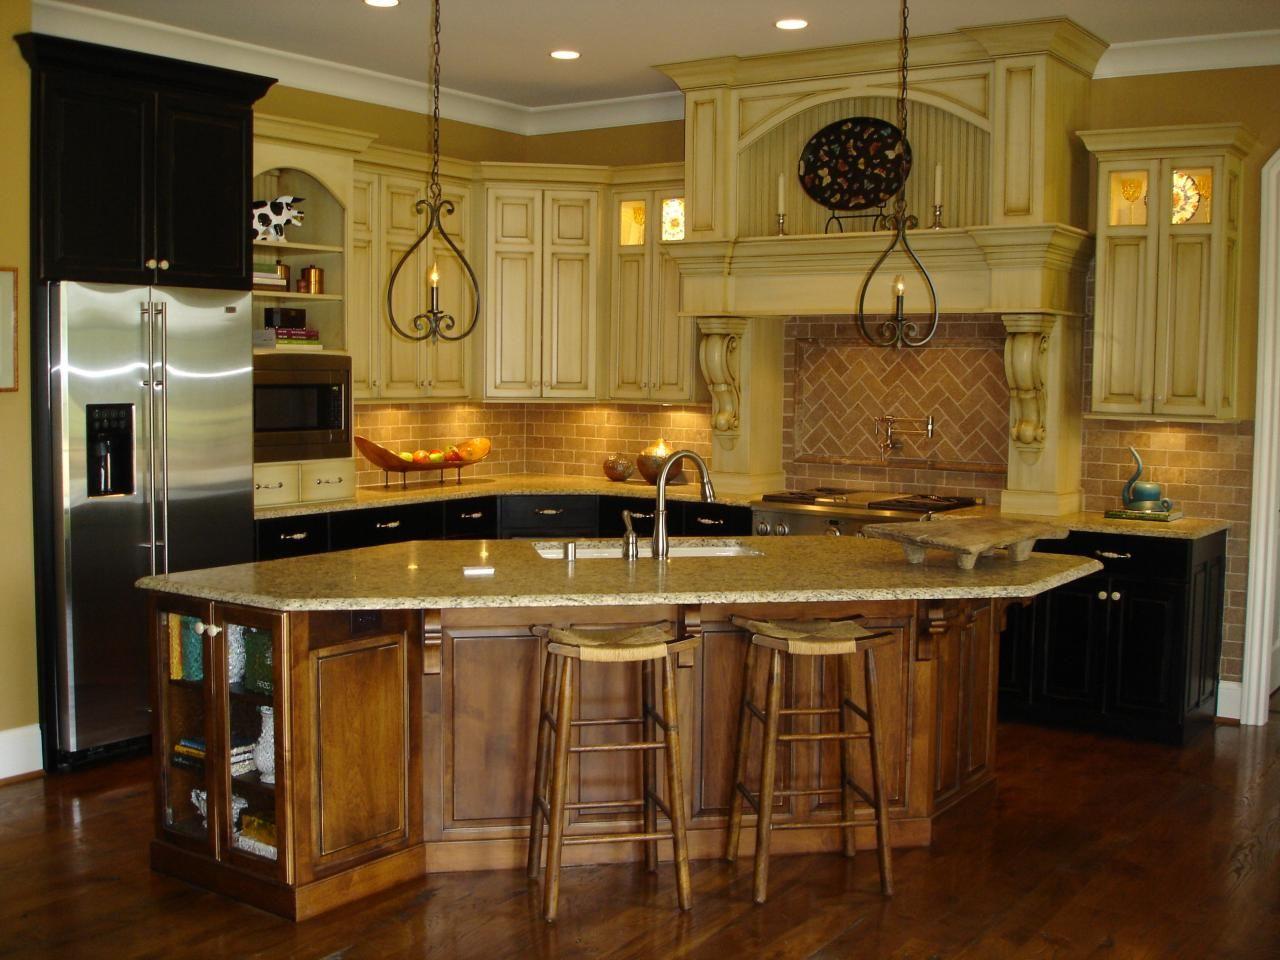 Custom Kitchens Kitchen Cabinet Styles Custom Kitchens Kitchen Interior